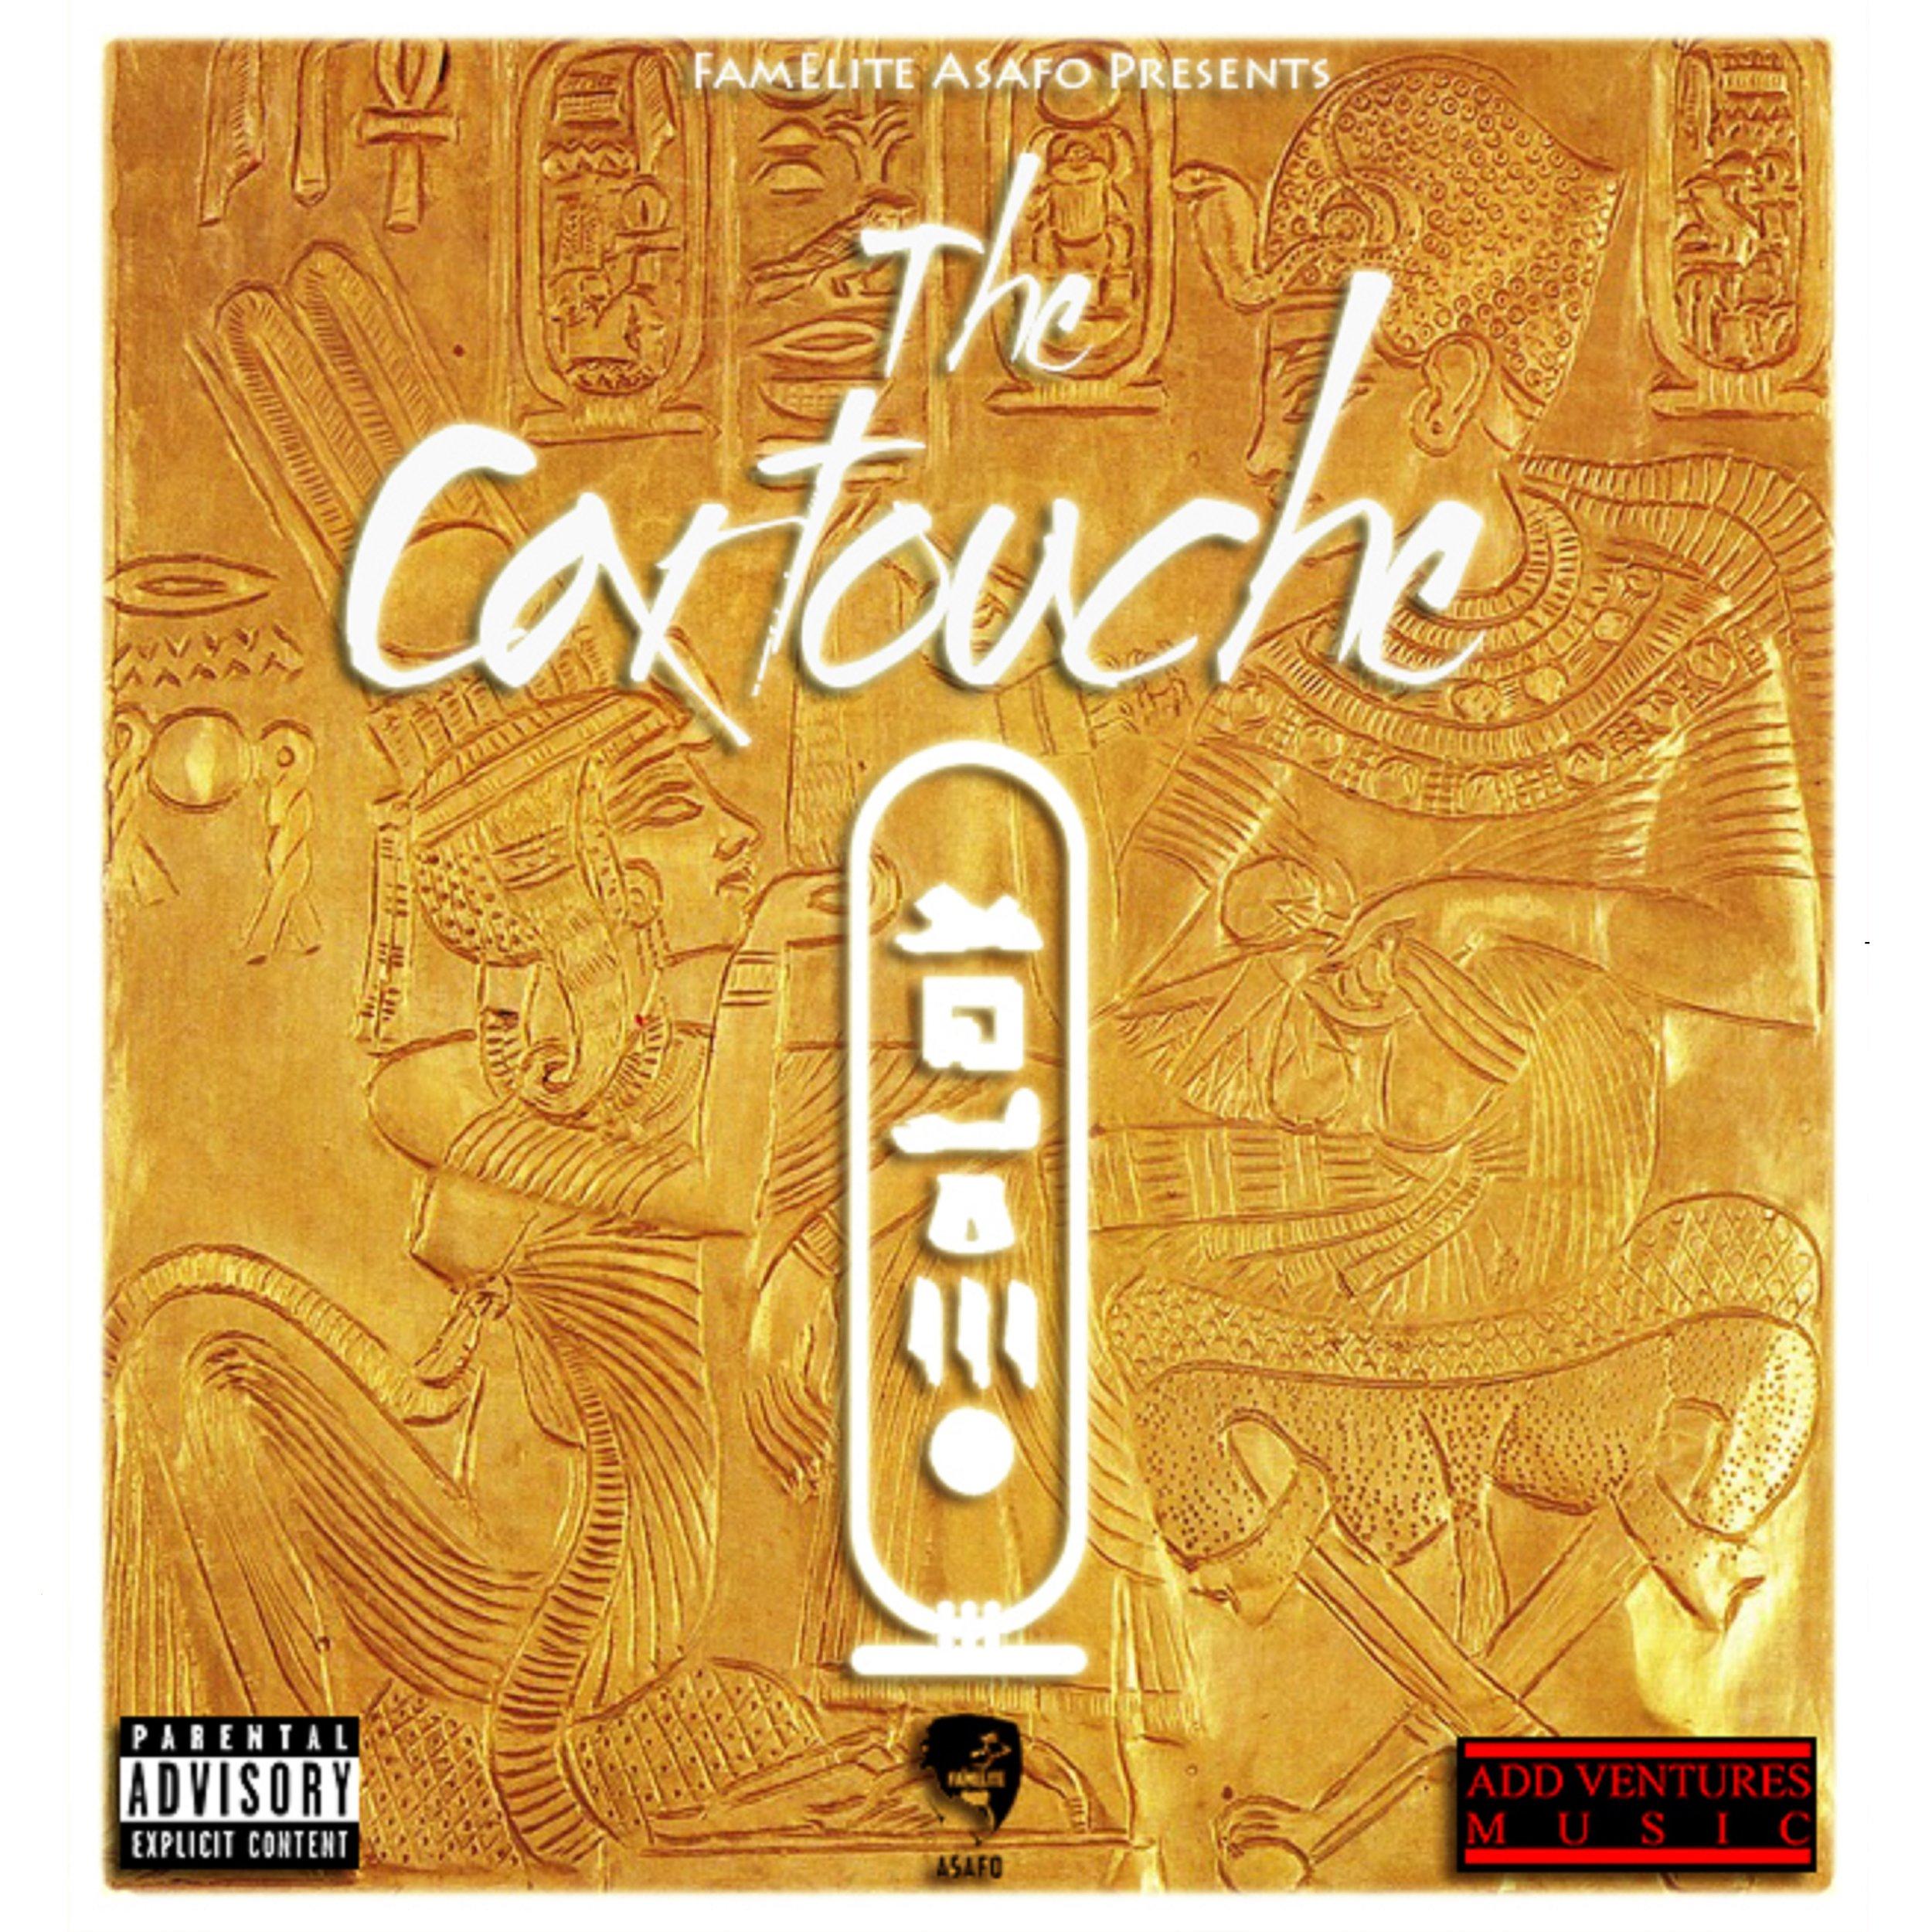 FamElite Asafo - Cartouche Album Cover - Explicit.jpg